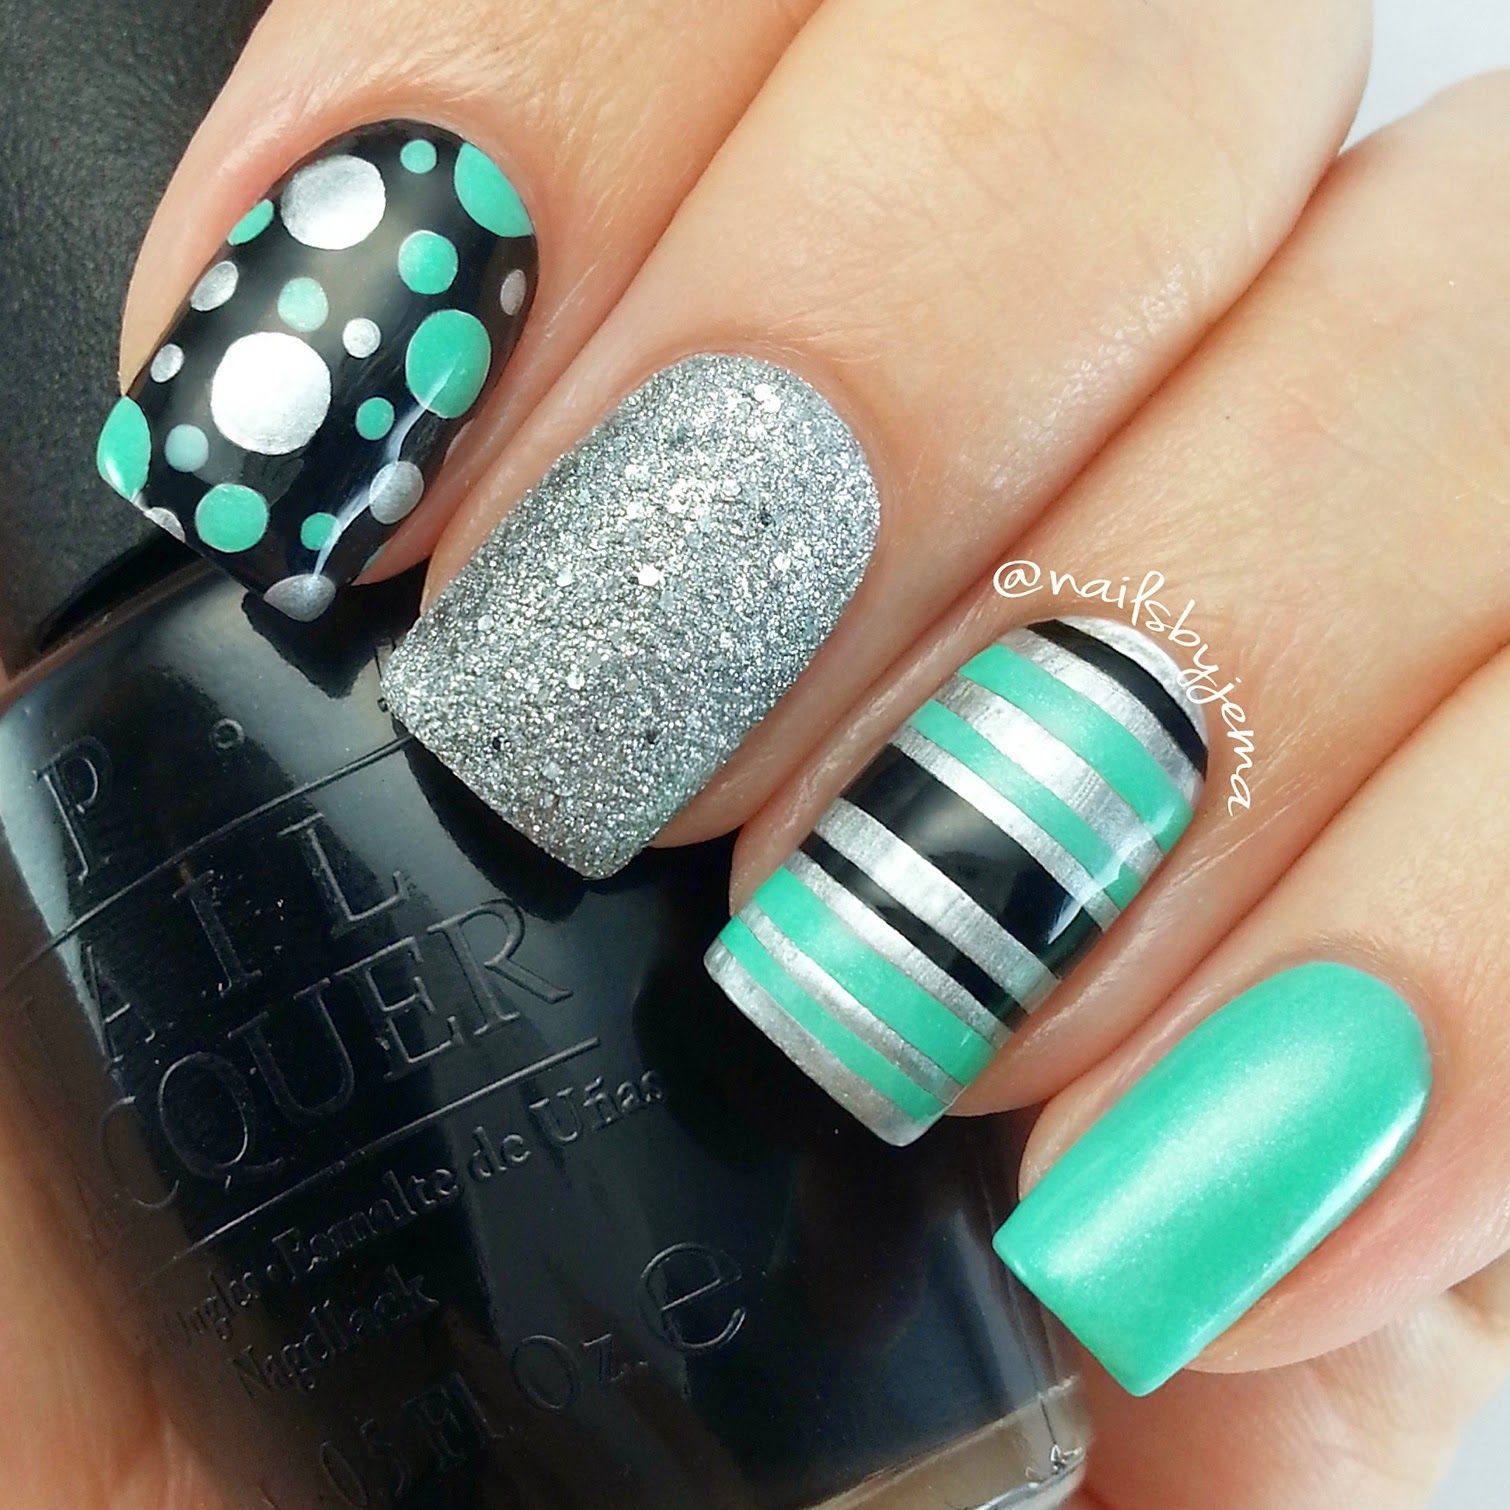 Nails By Jema: Busy Little Bee | nails | Pinterest | Bees, Nail nail ...